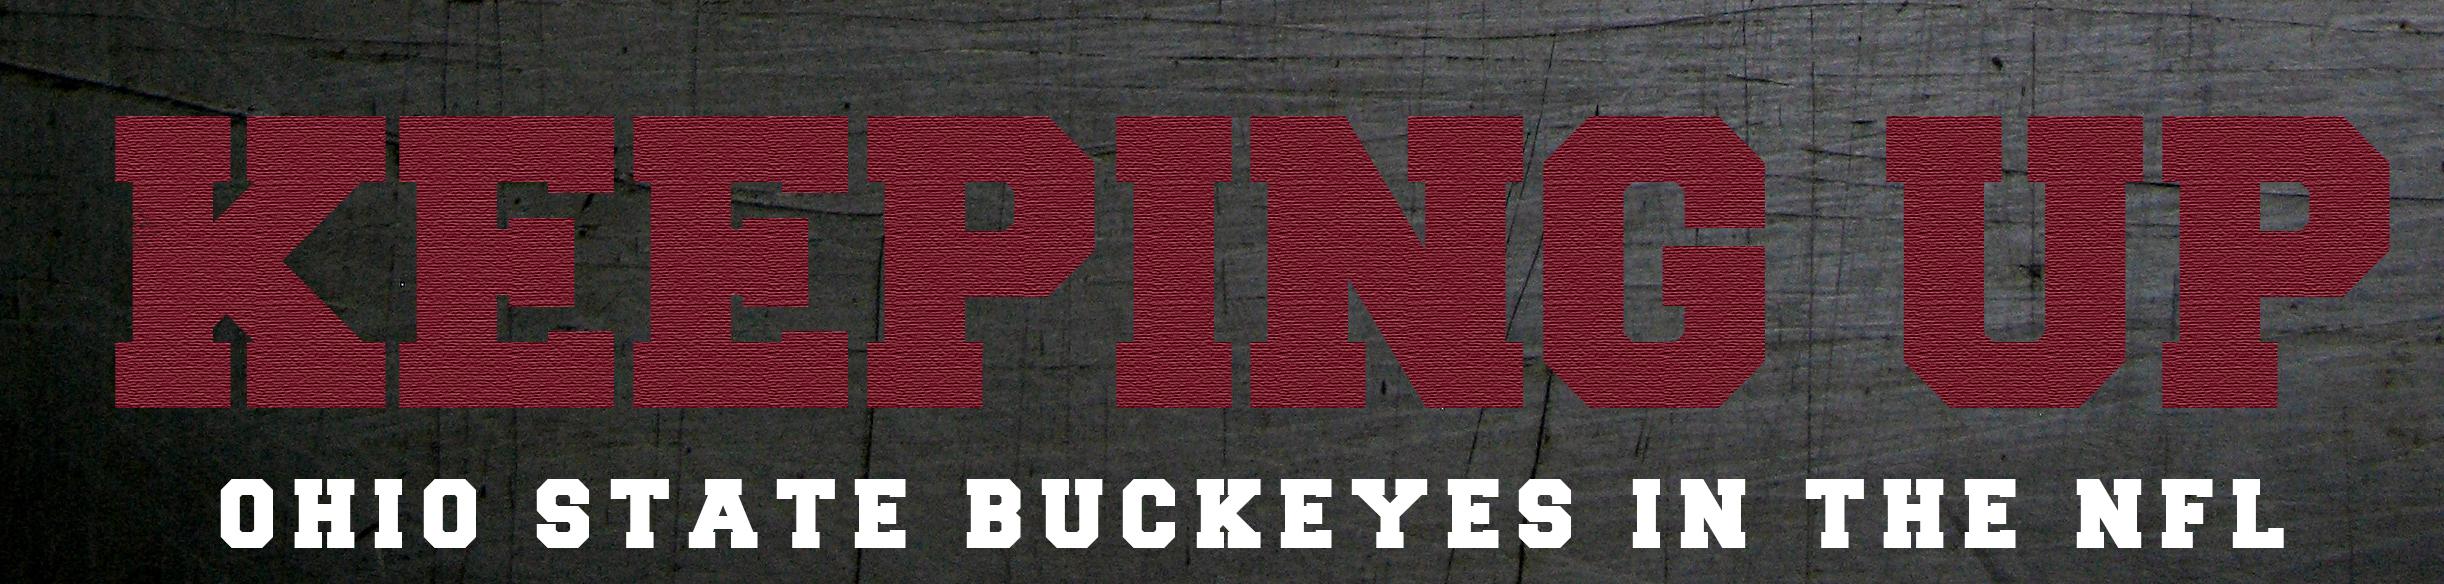 Buckeye-in-the-nfl_medium